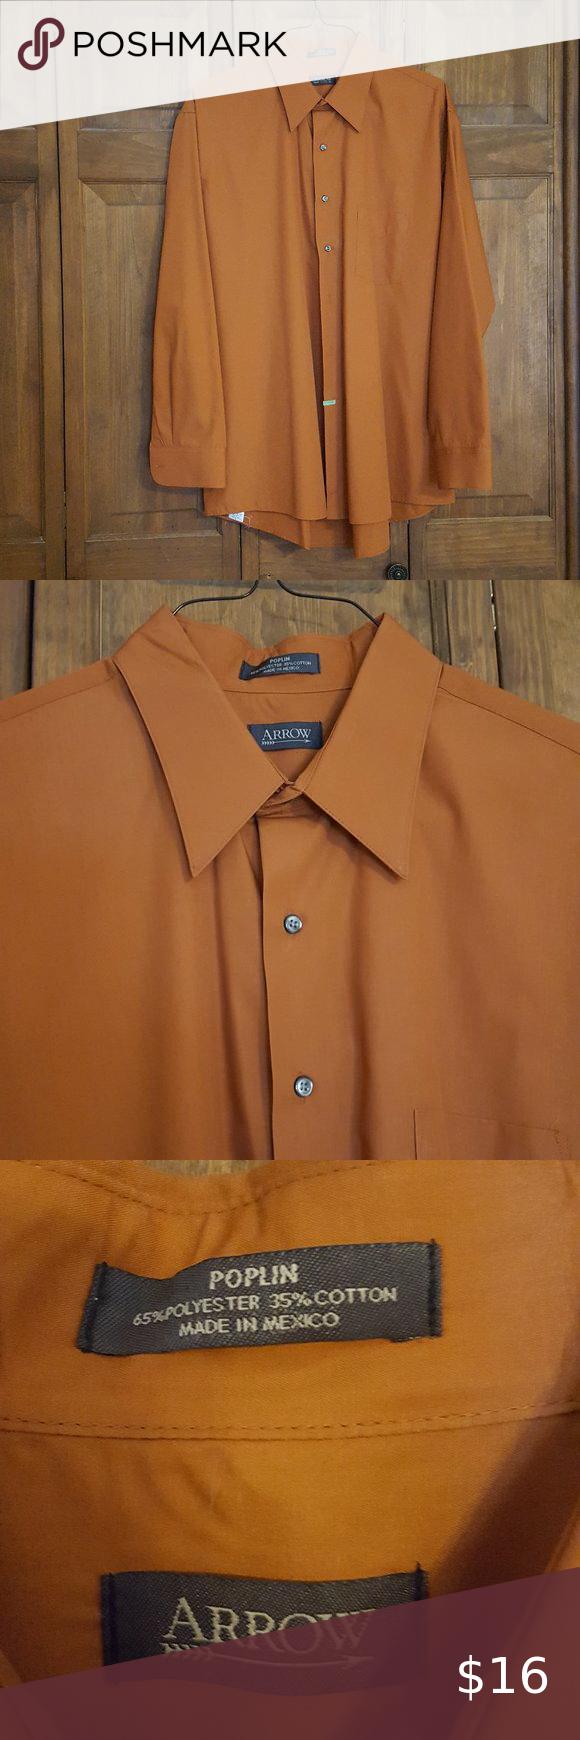 Arrow Burnt Orange Button Down Dress Shirt Xxlg Online Shopping Clothes Women Shirts Button Down Dress [ 1740 x 580 Pixel ]